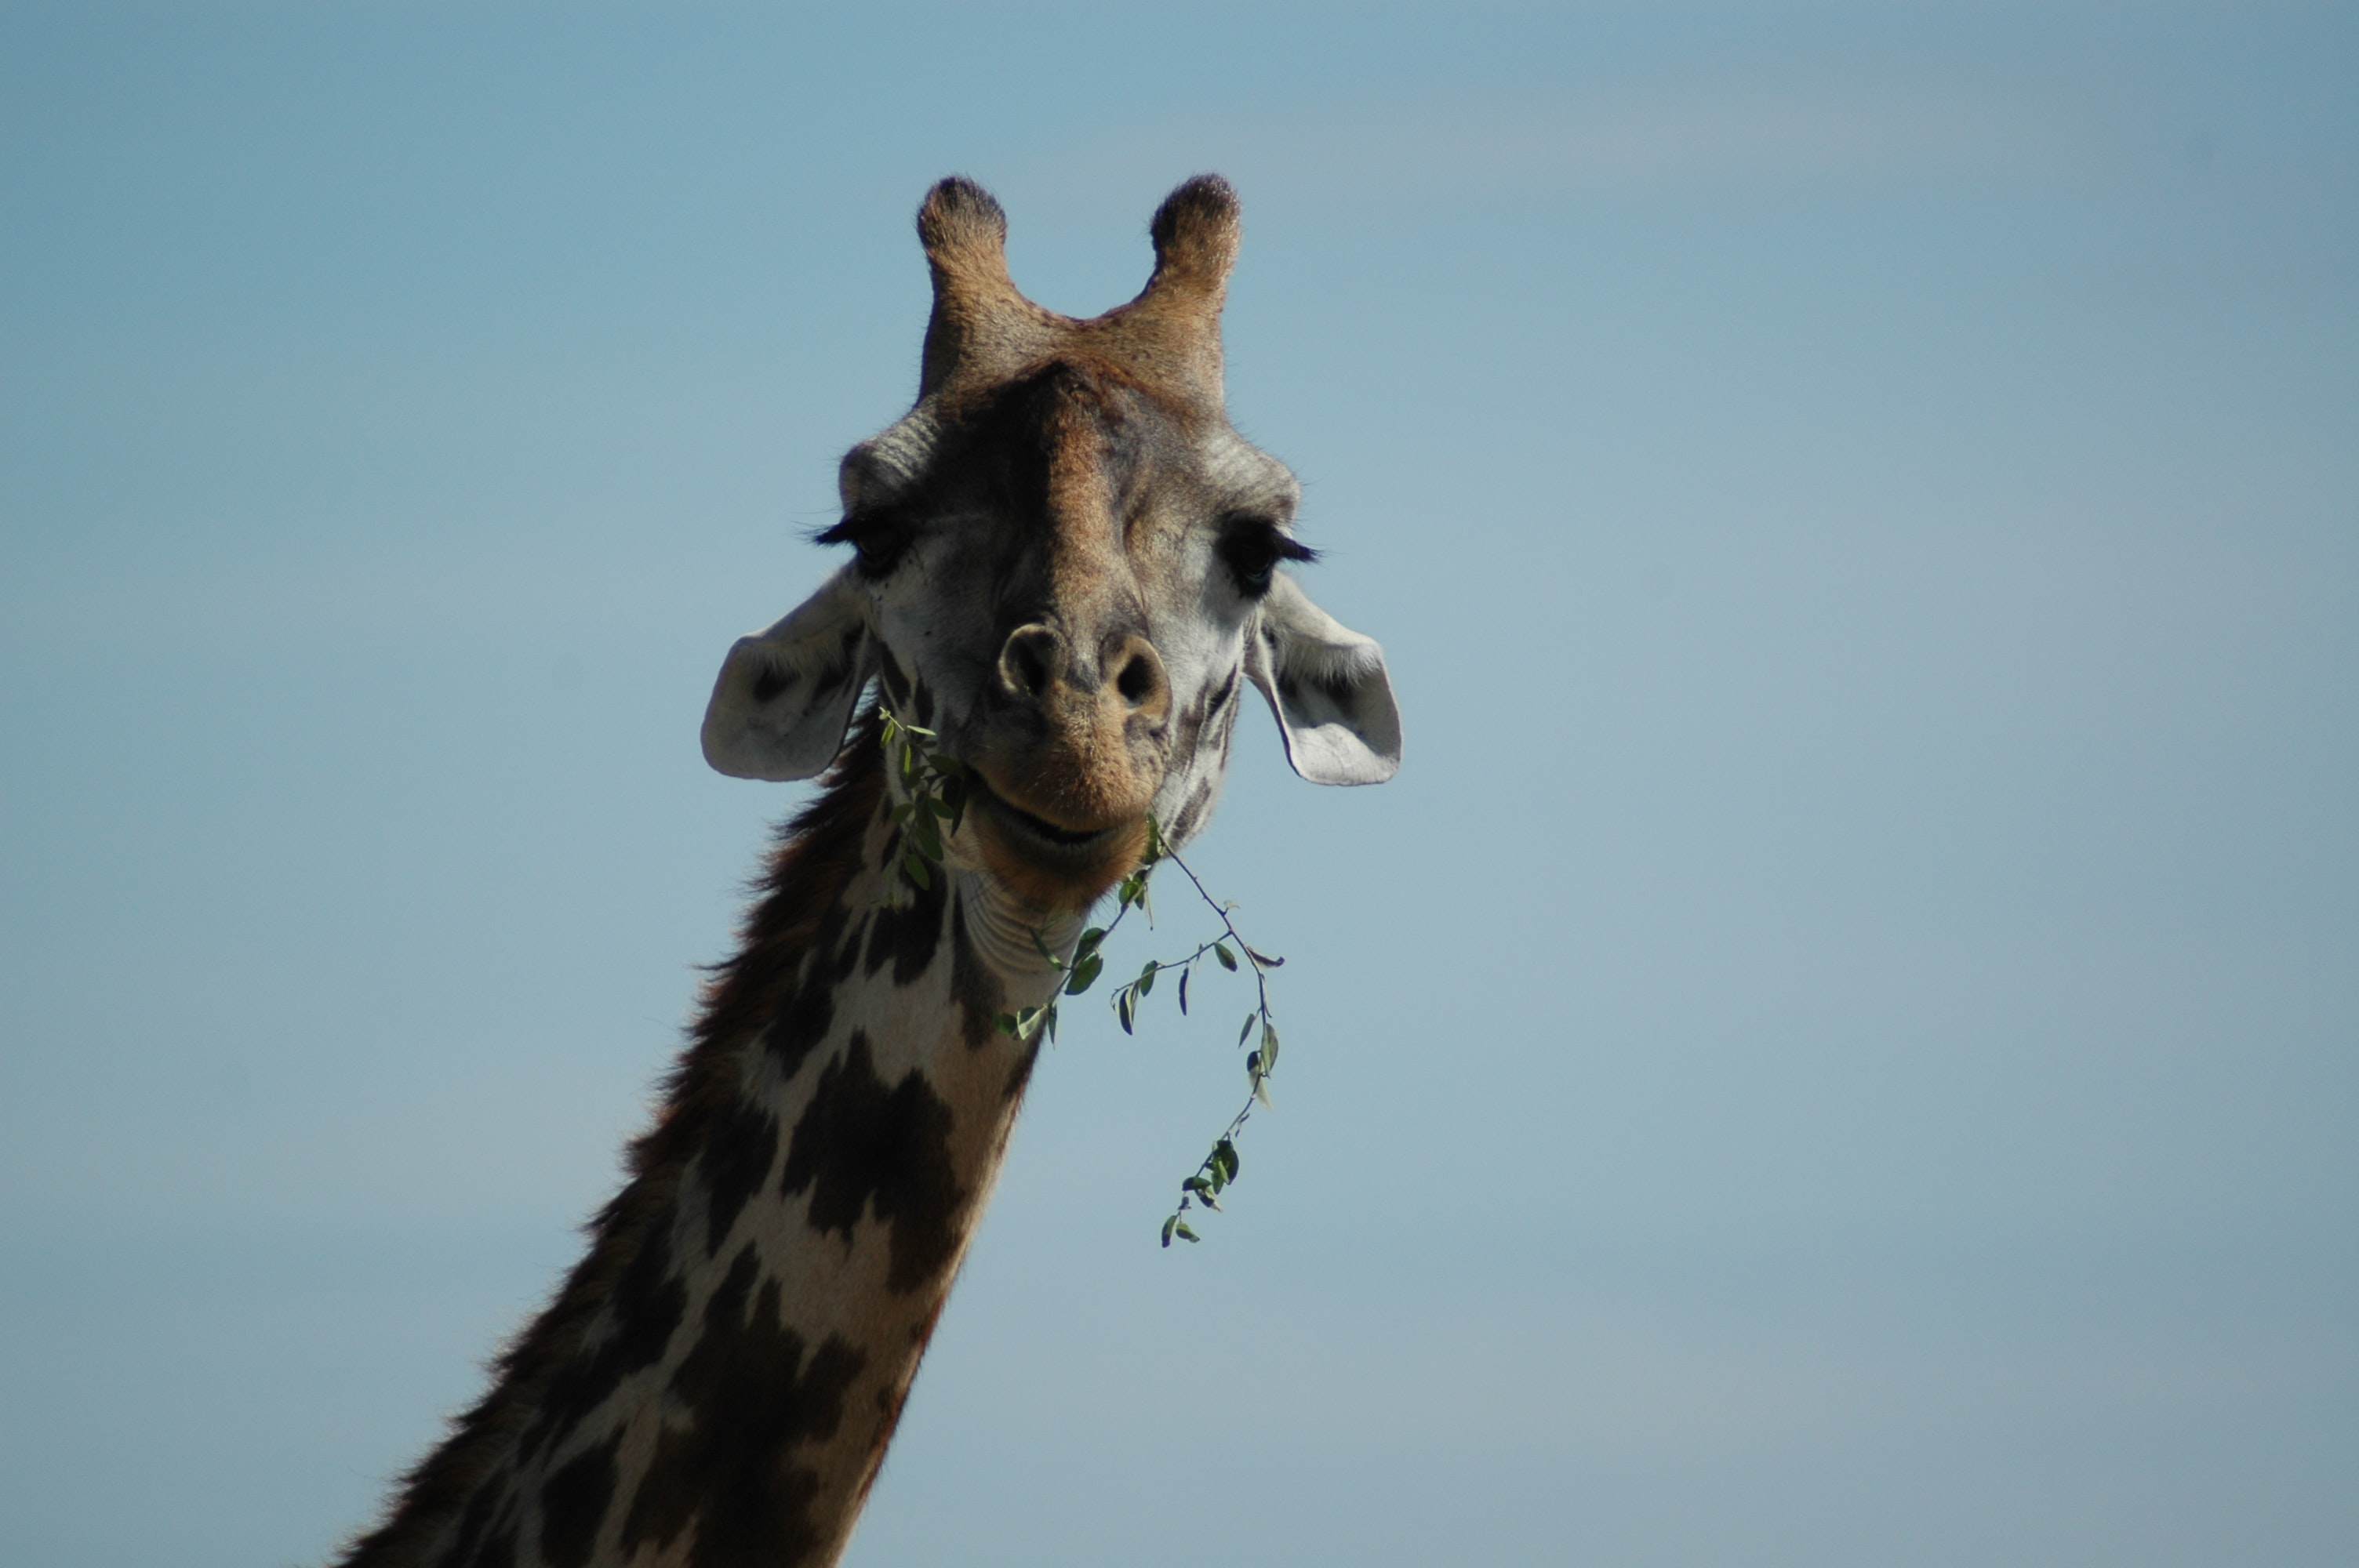 selective color photography of brown giraffe